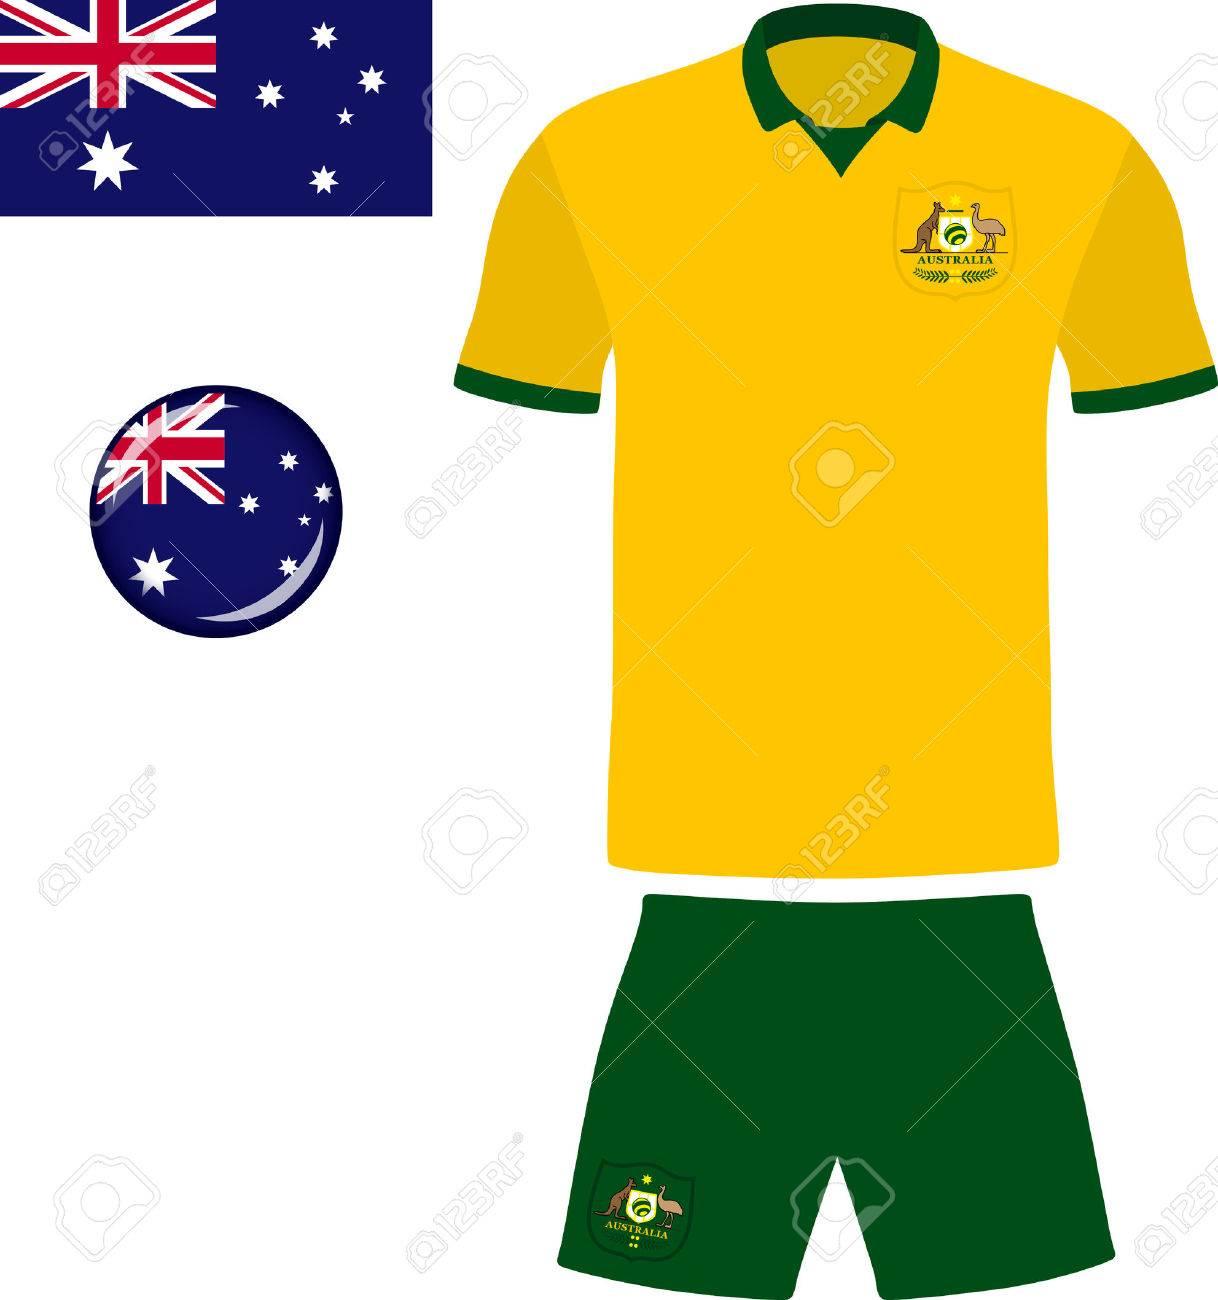 0e77172e47c Australia Football Jersey. Vector graphic illustration representing the national  football jersey of Australia. Stock